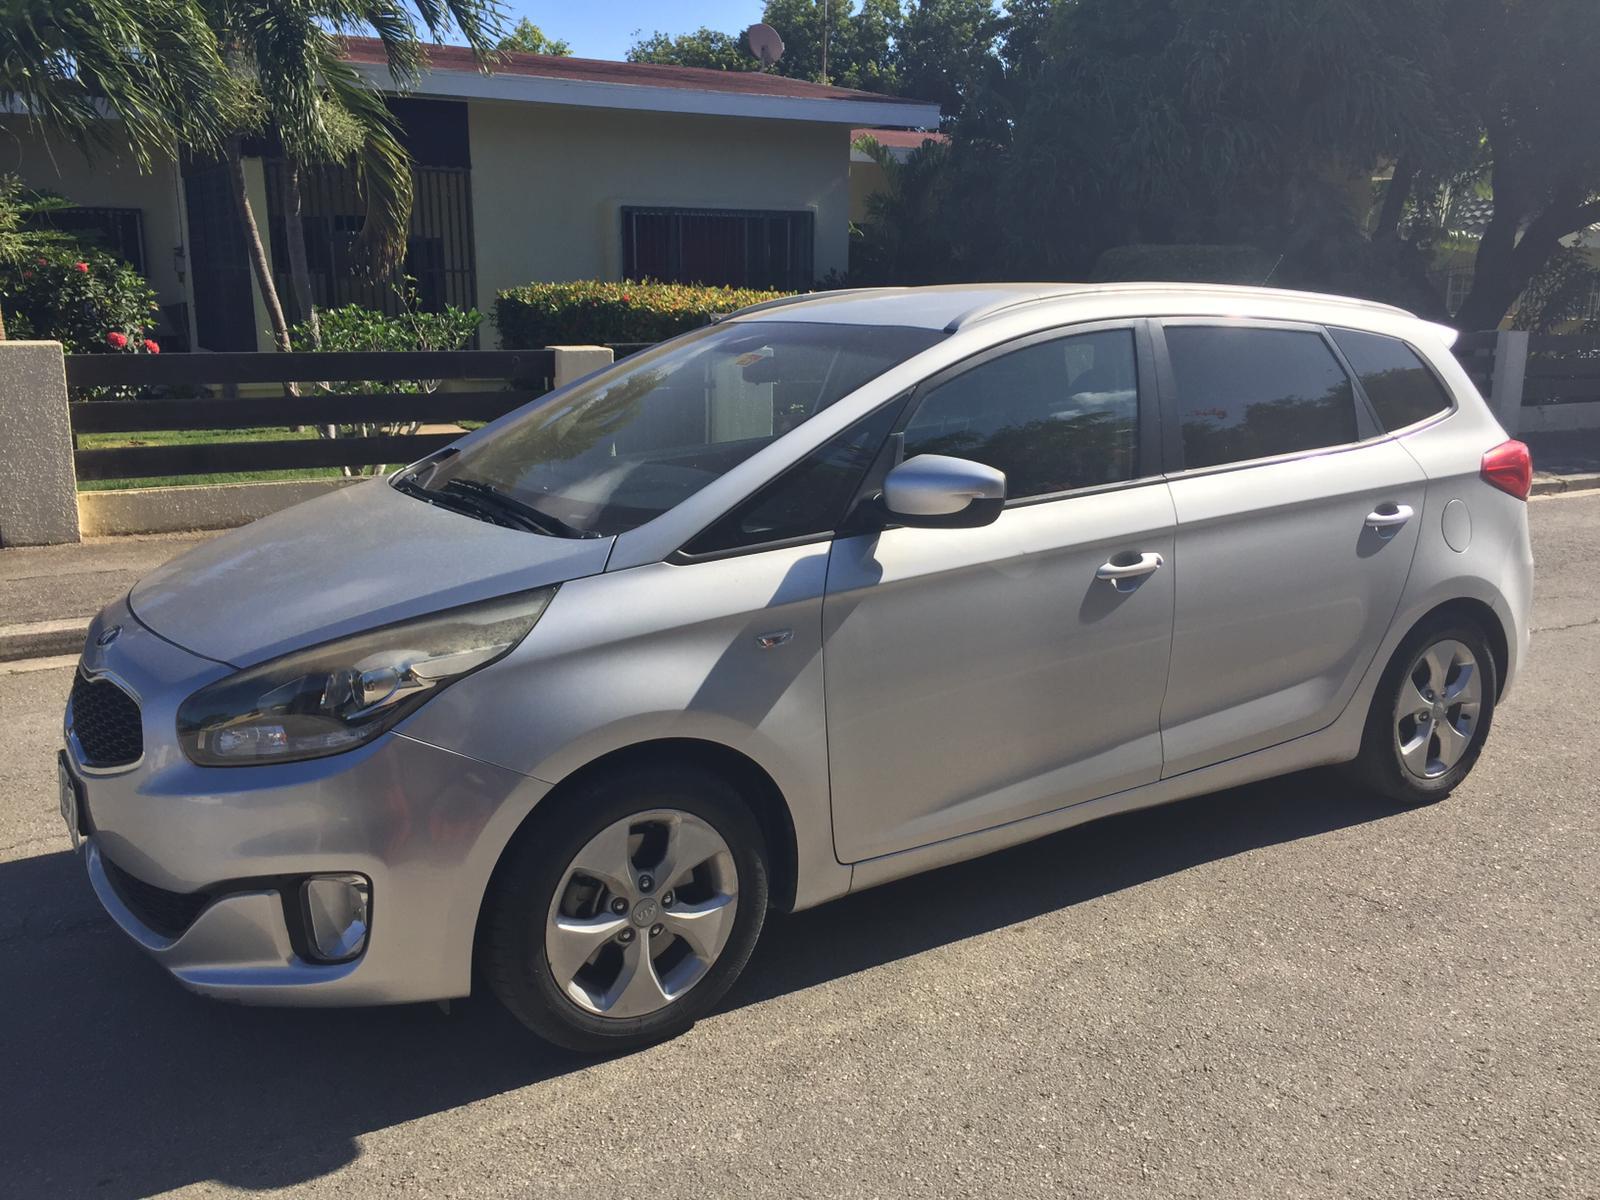 car: kia carens july 2020 | auto's op curacao